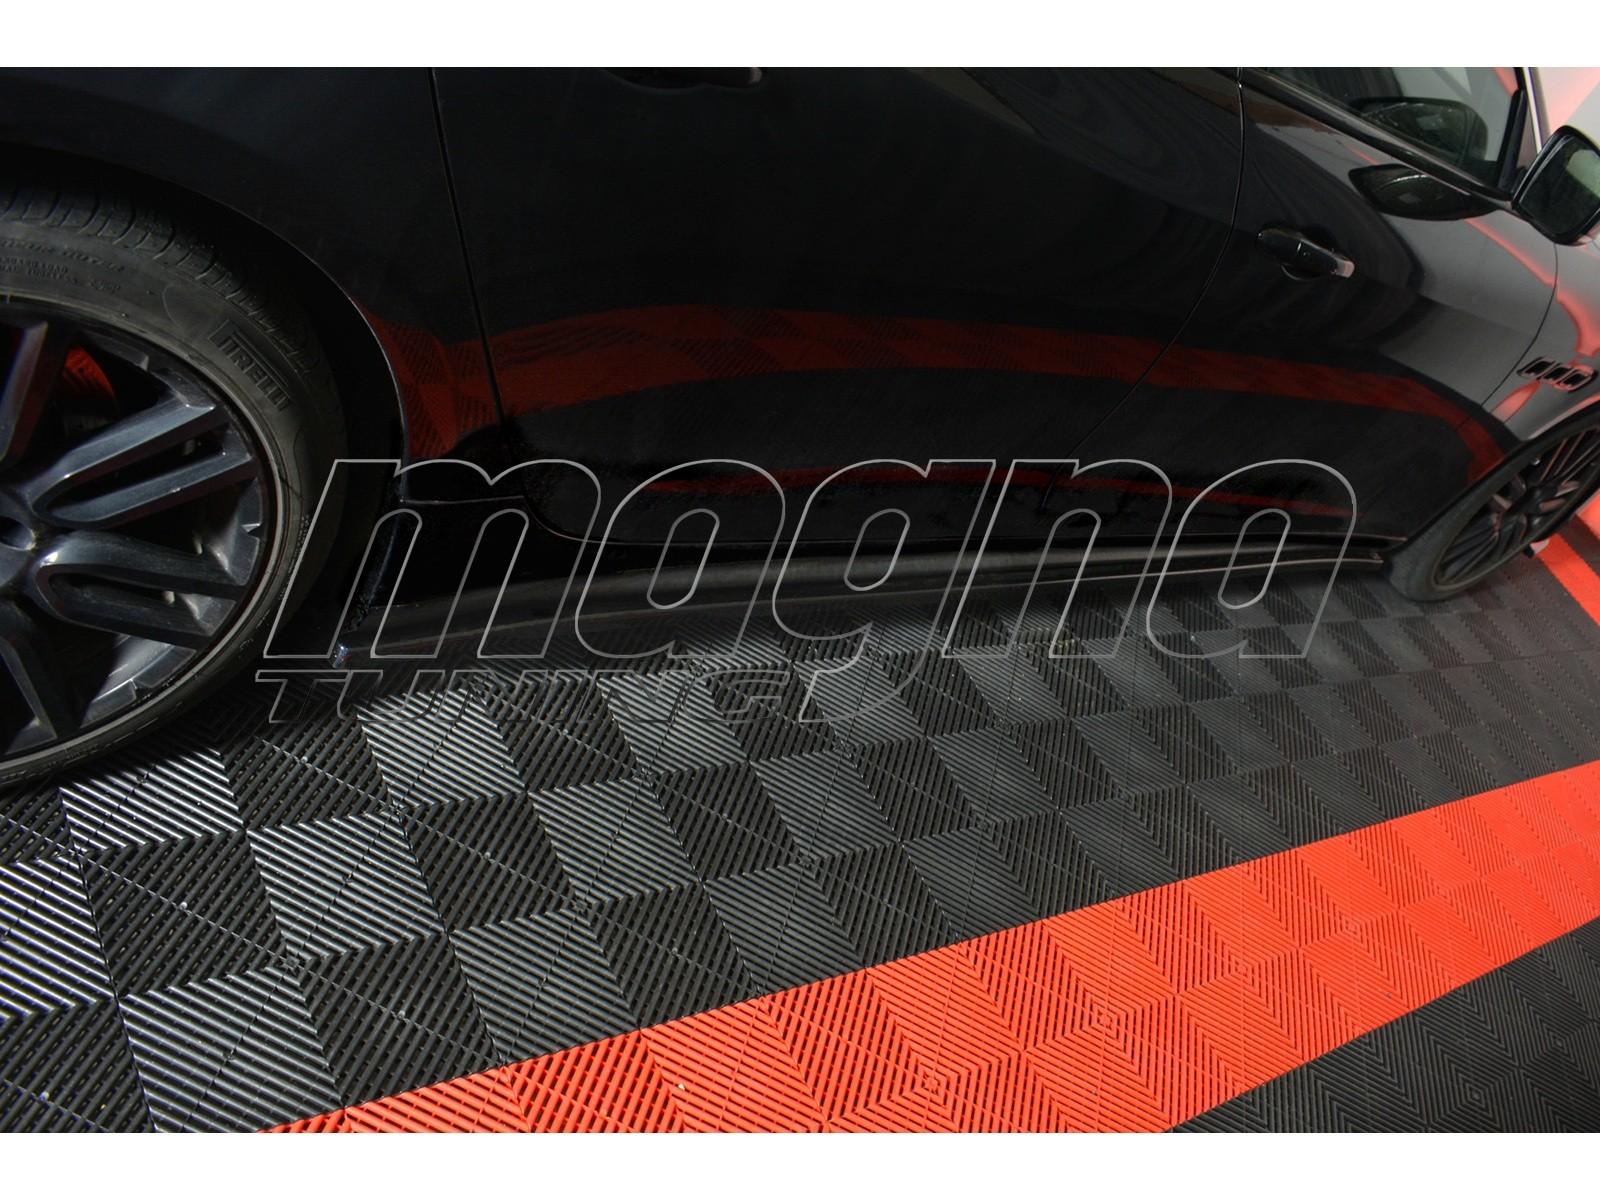 Maserati Quattroporte M156 MX Body Kit